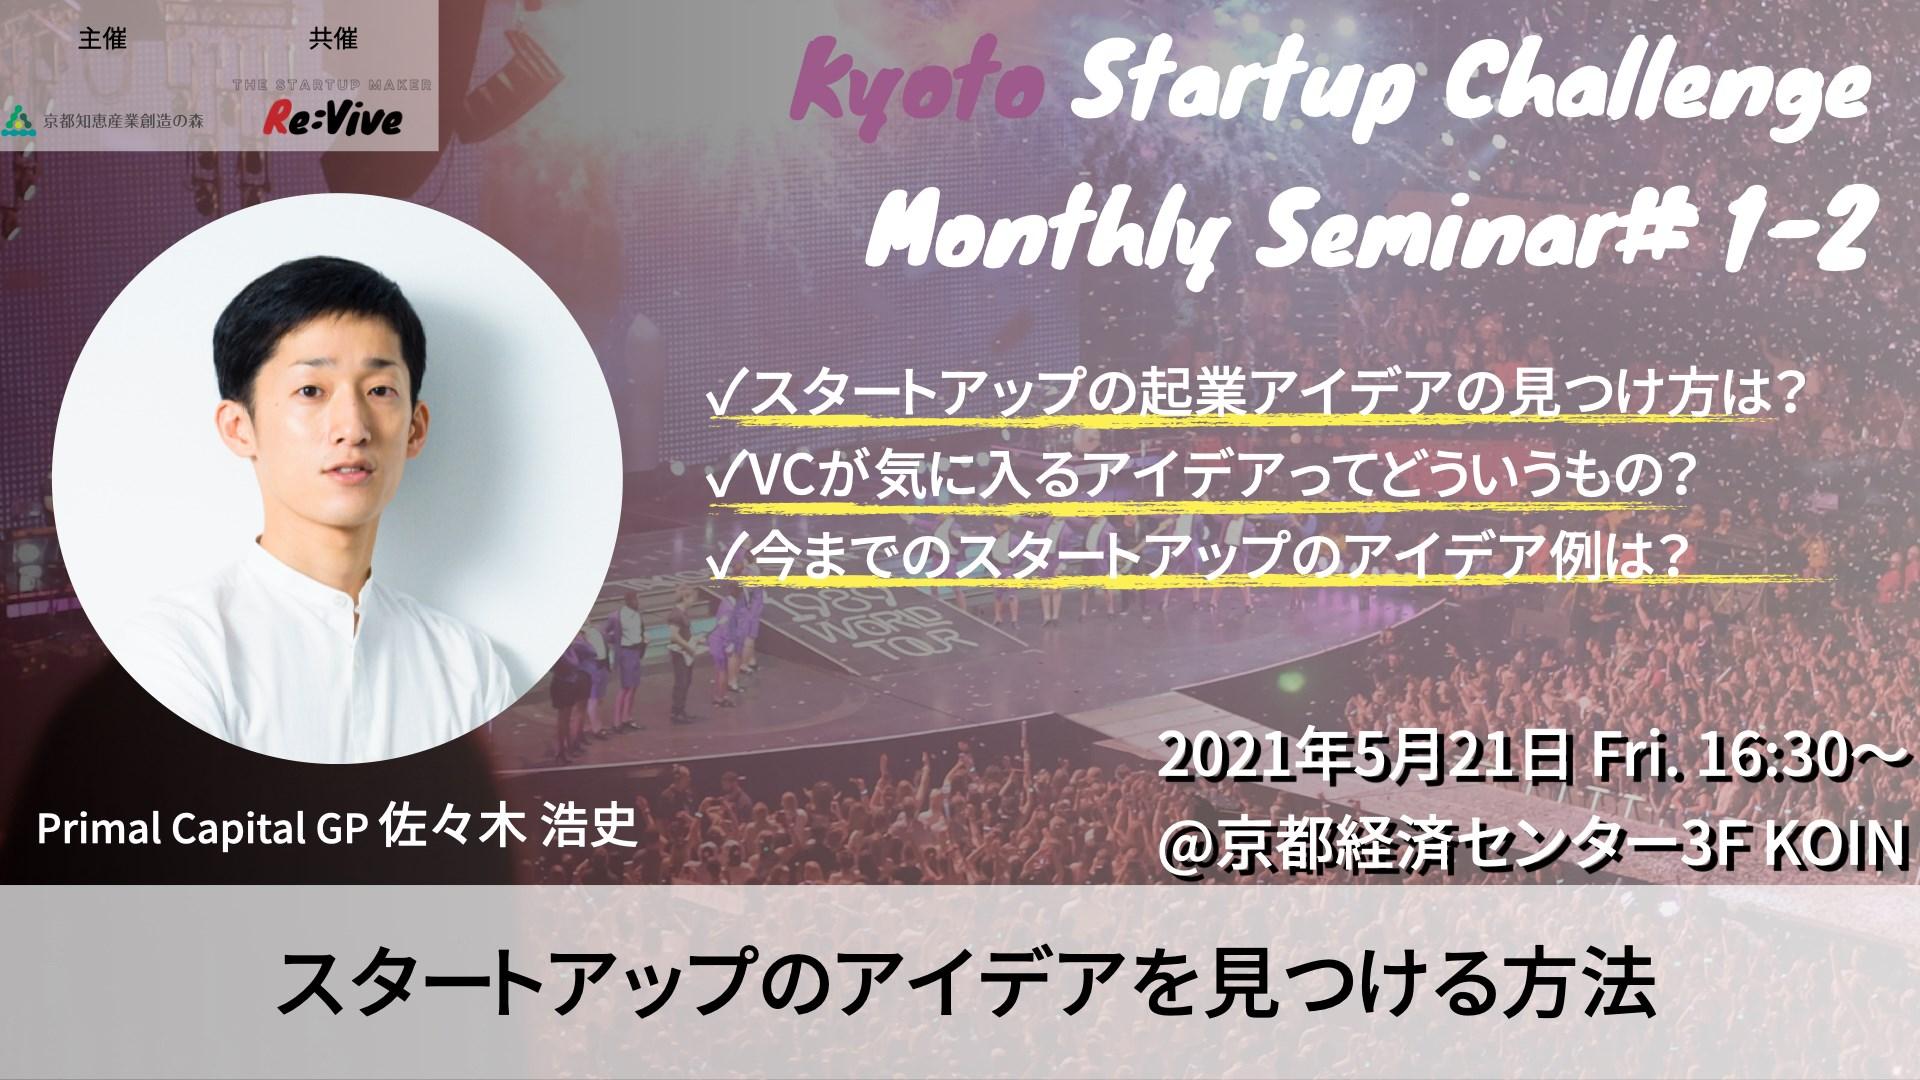 Kyoto Startup Challenge / Seminar ② – スタートアップのアイデアを見つける方法 –